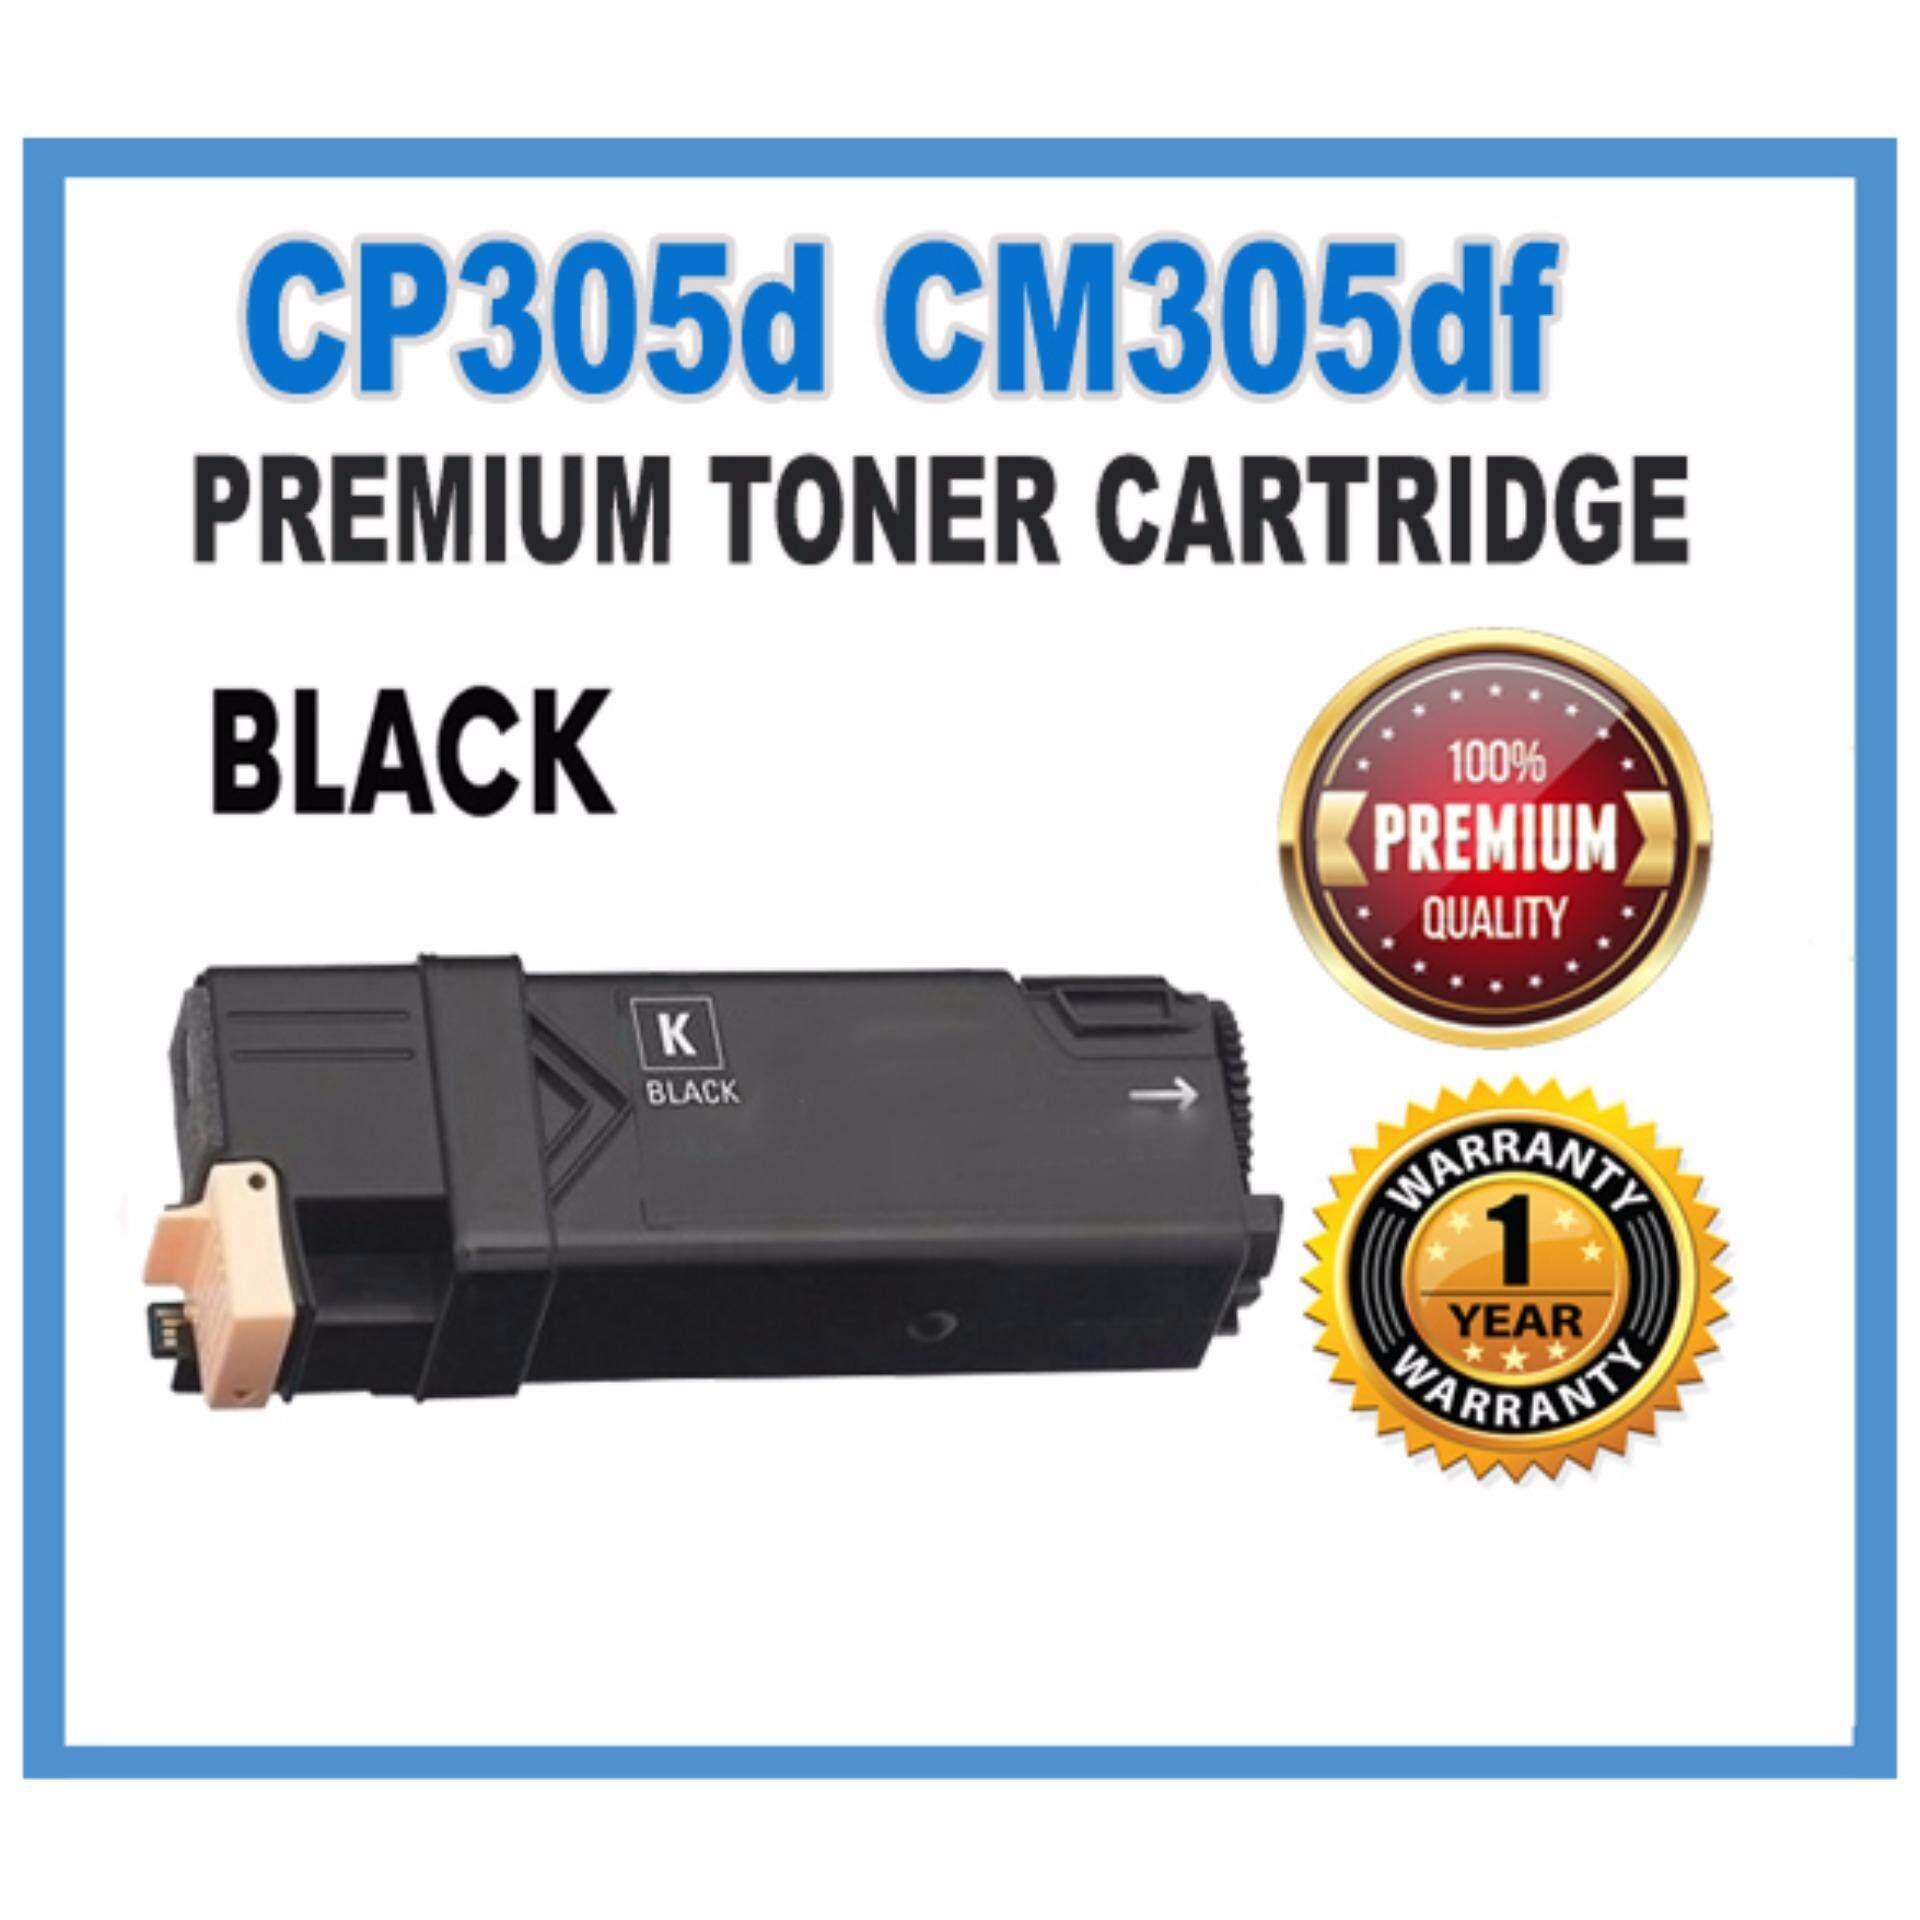 Fuji Xerox Docuprint Cm225fw Putih Daftar Harga Terbaru Indonesia Fujixerox Dpm115z Premium Grade Cp305d Cm305df Black Compatible Toner Cp305 Cm305